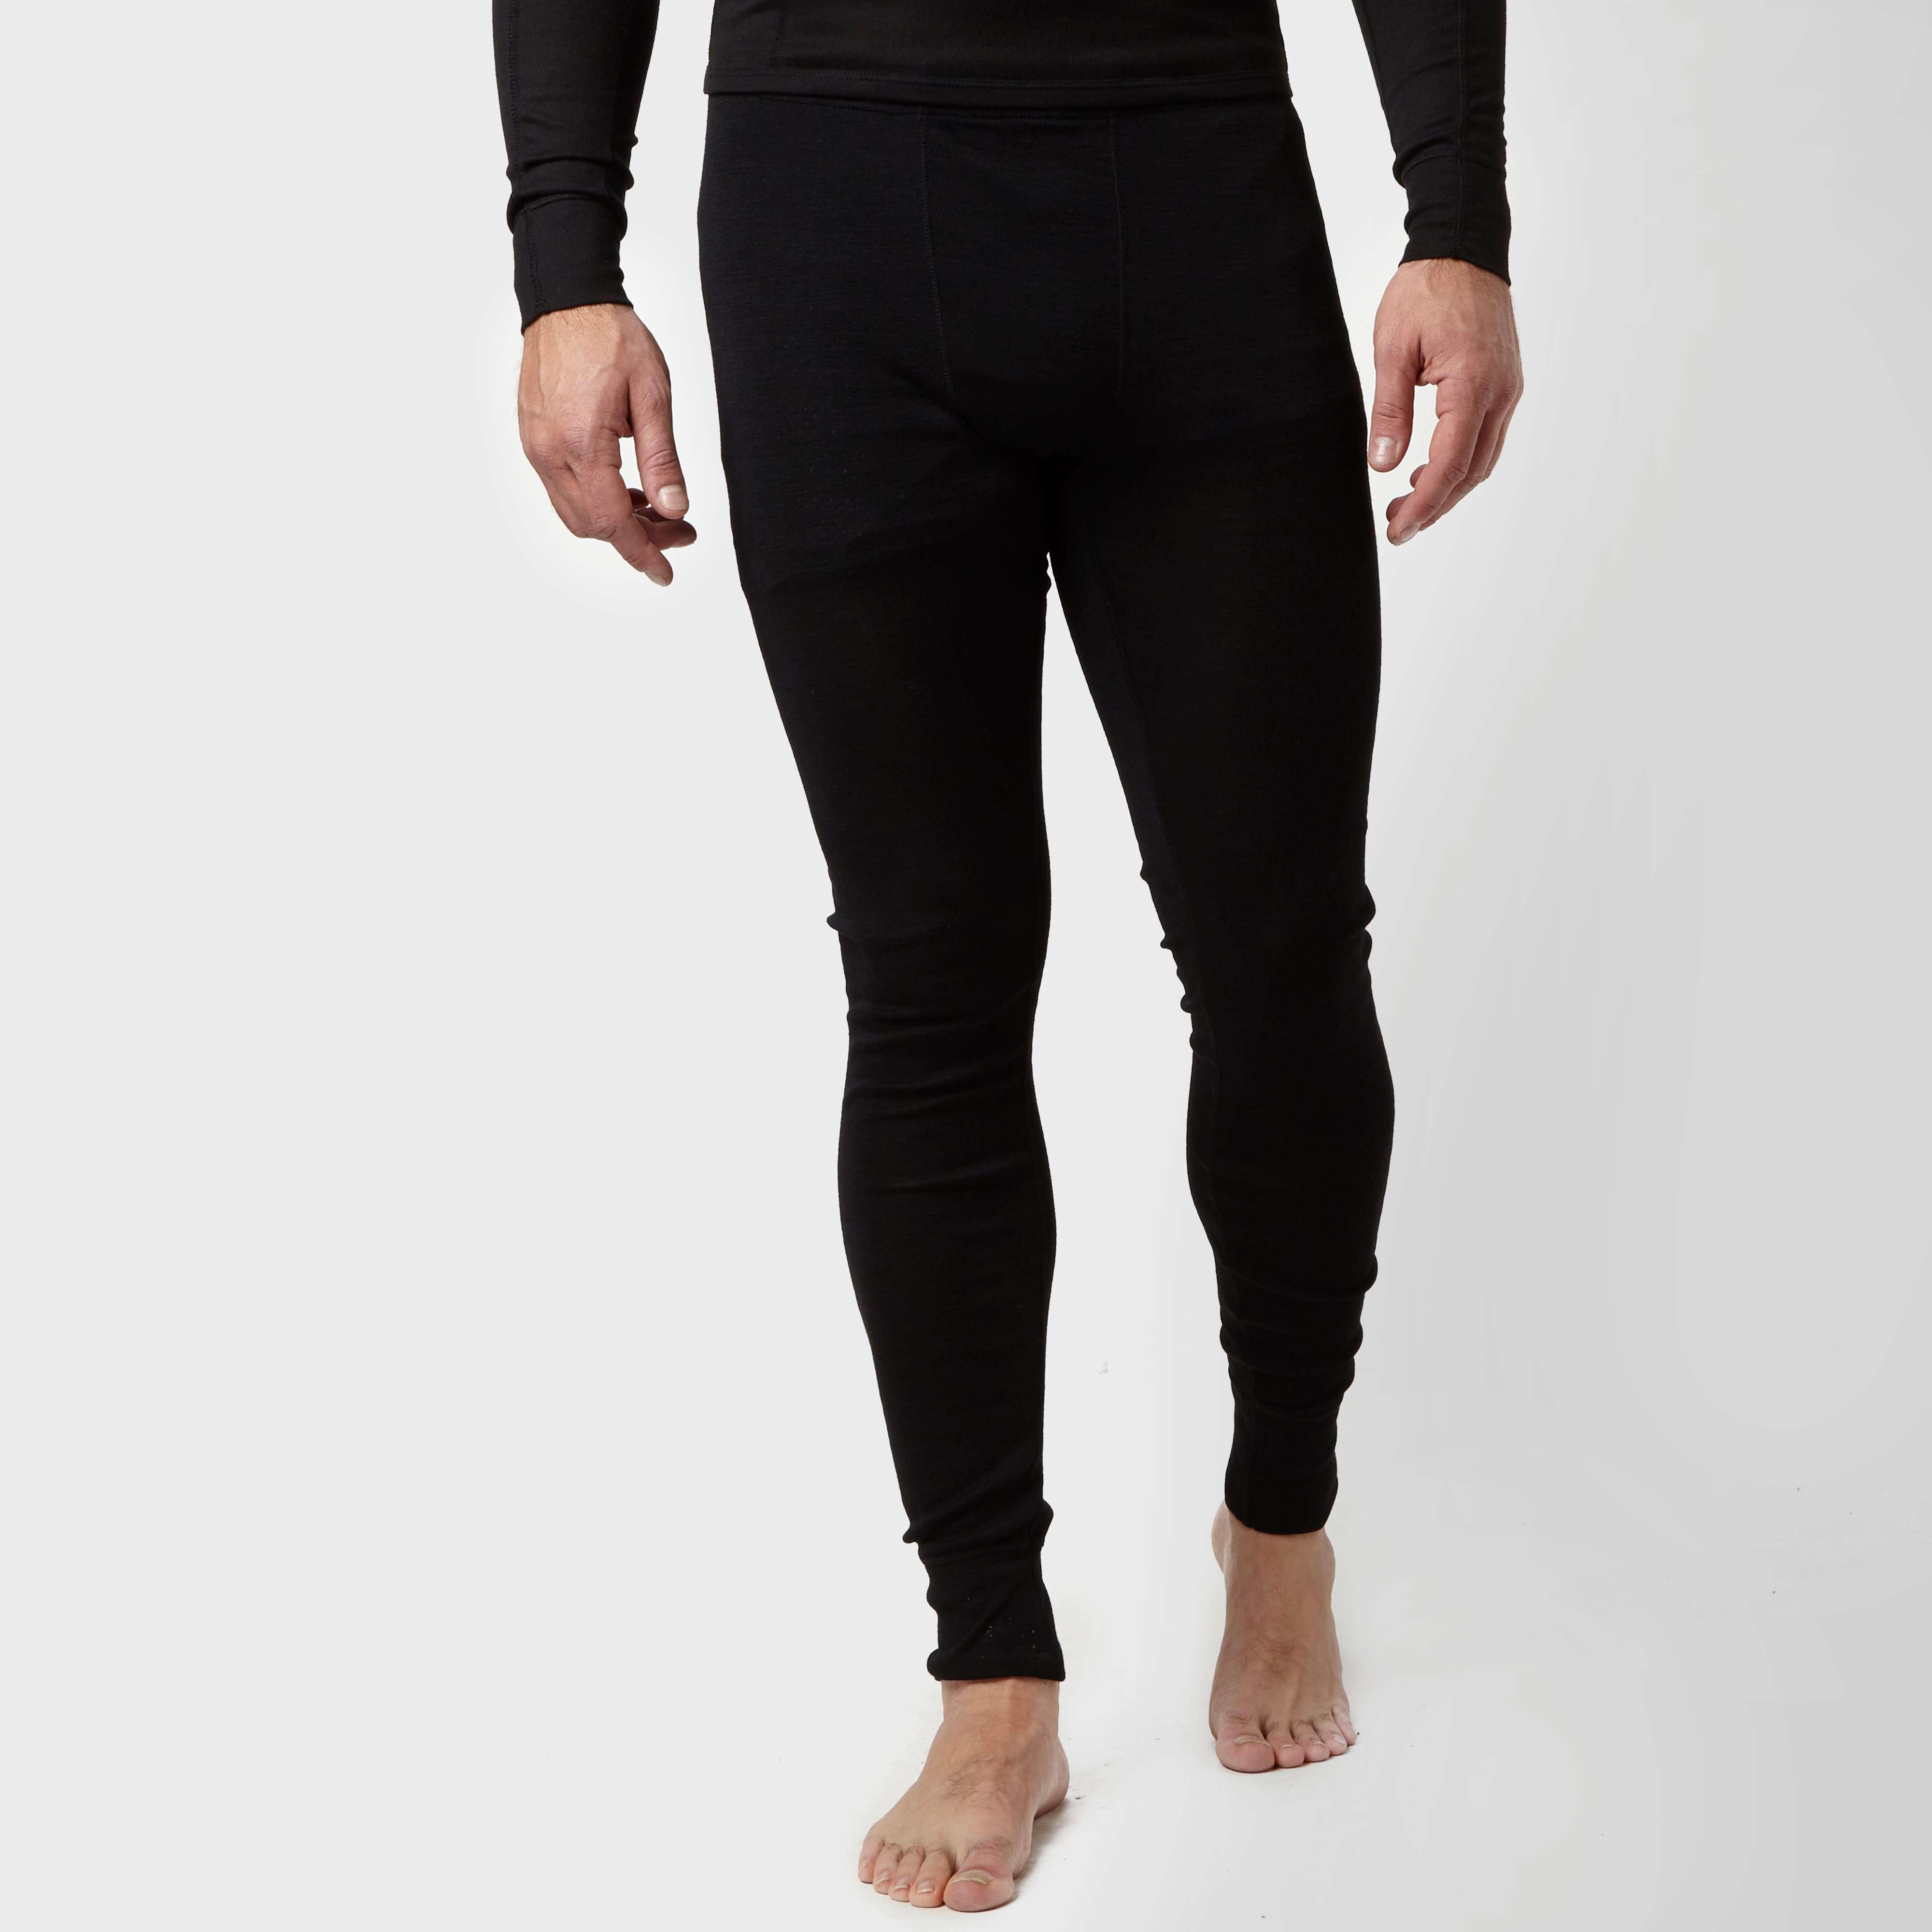 PETER STORM Men's Merino Wool Baselayer Leggings